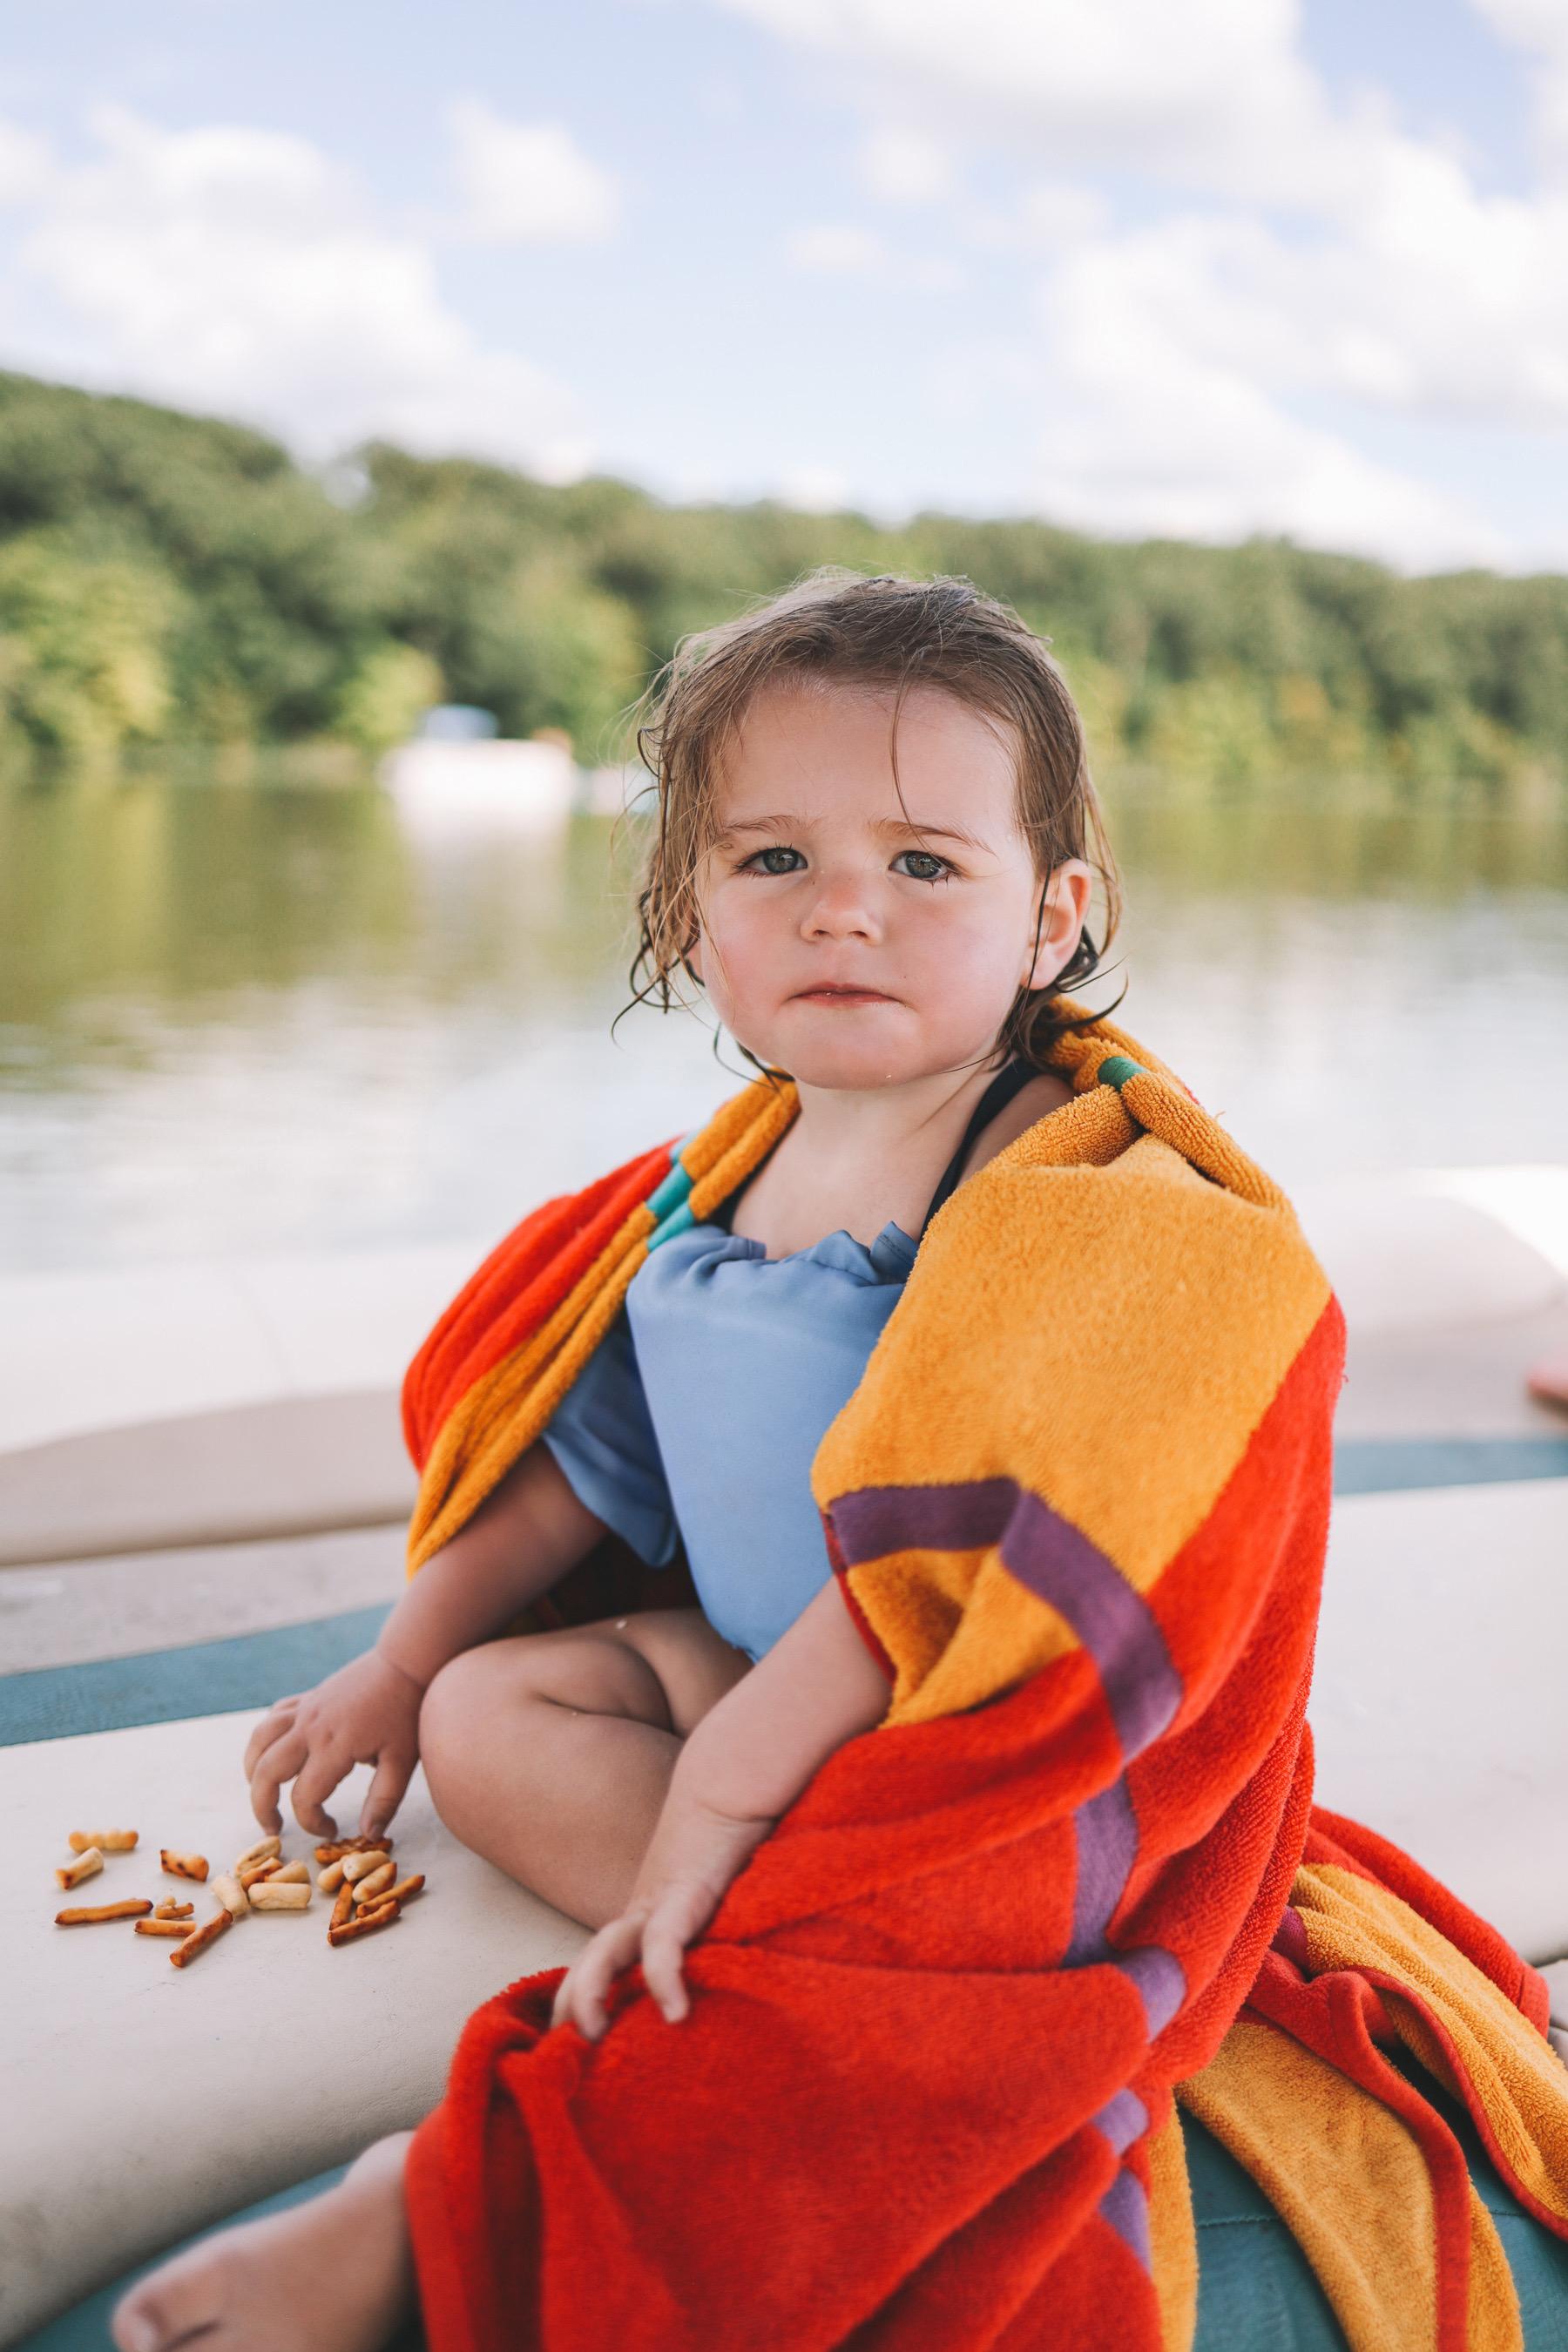 Lake Bloomington summer fun